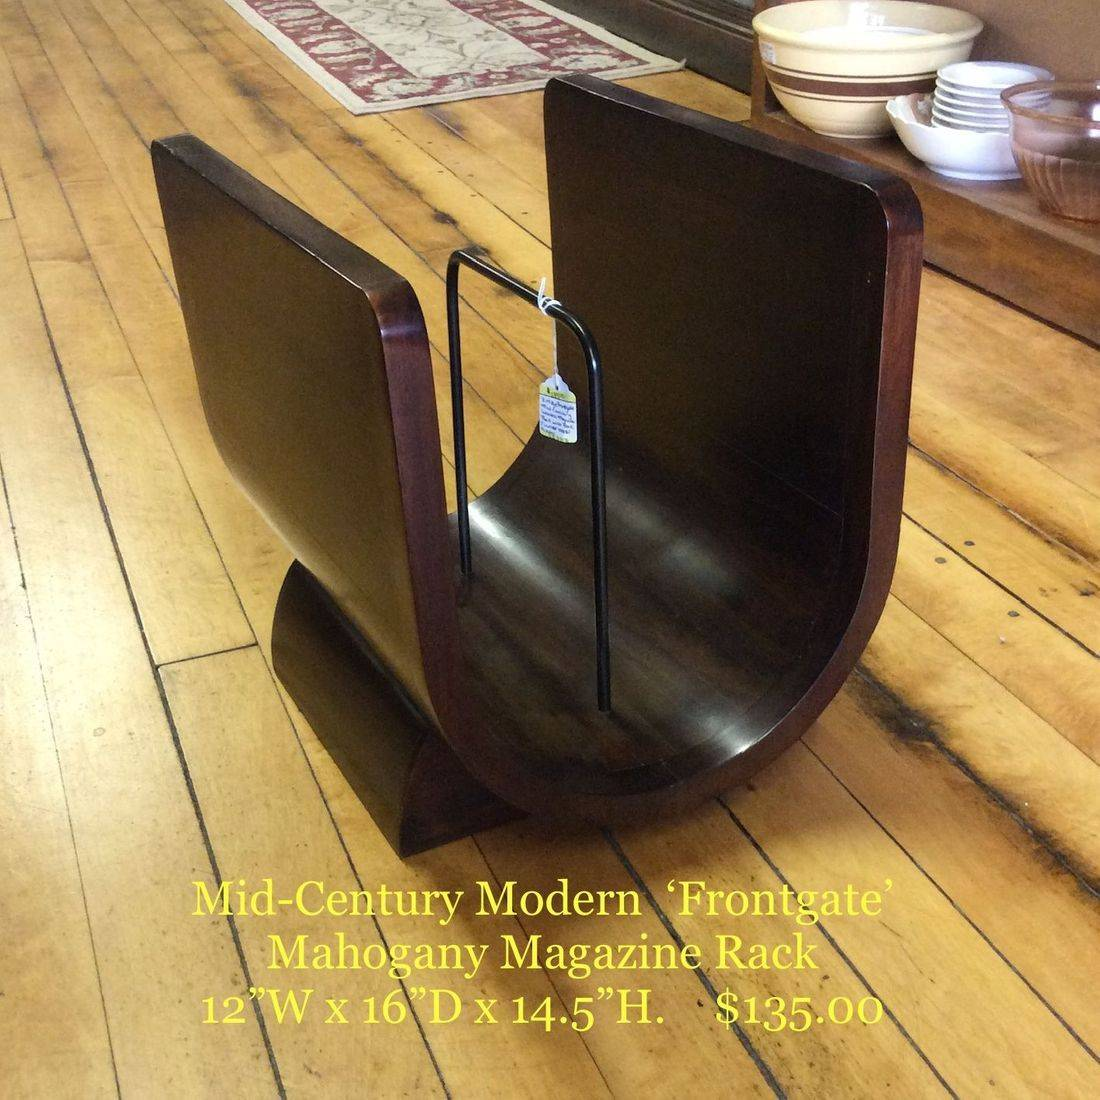 Mid-Century Modern 'Frontgate' Mahogany Magazine Rack   $135.00